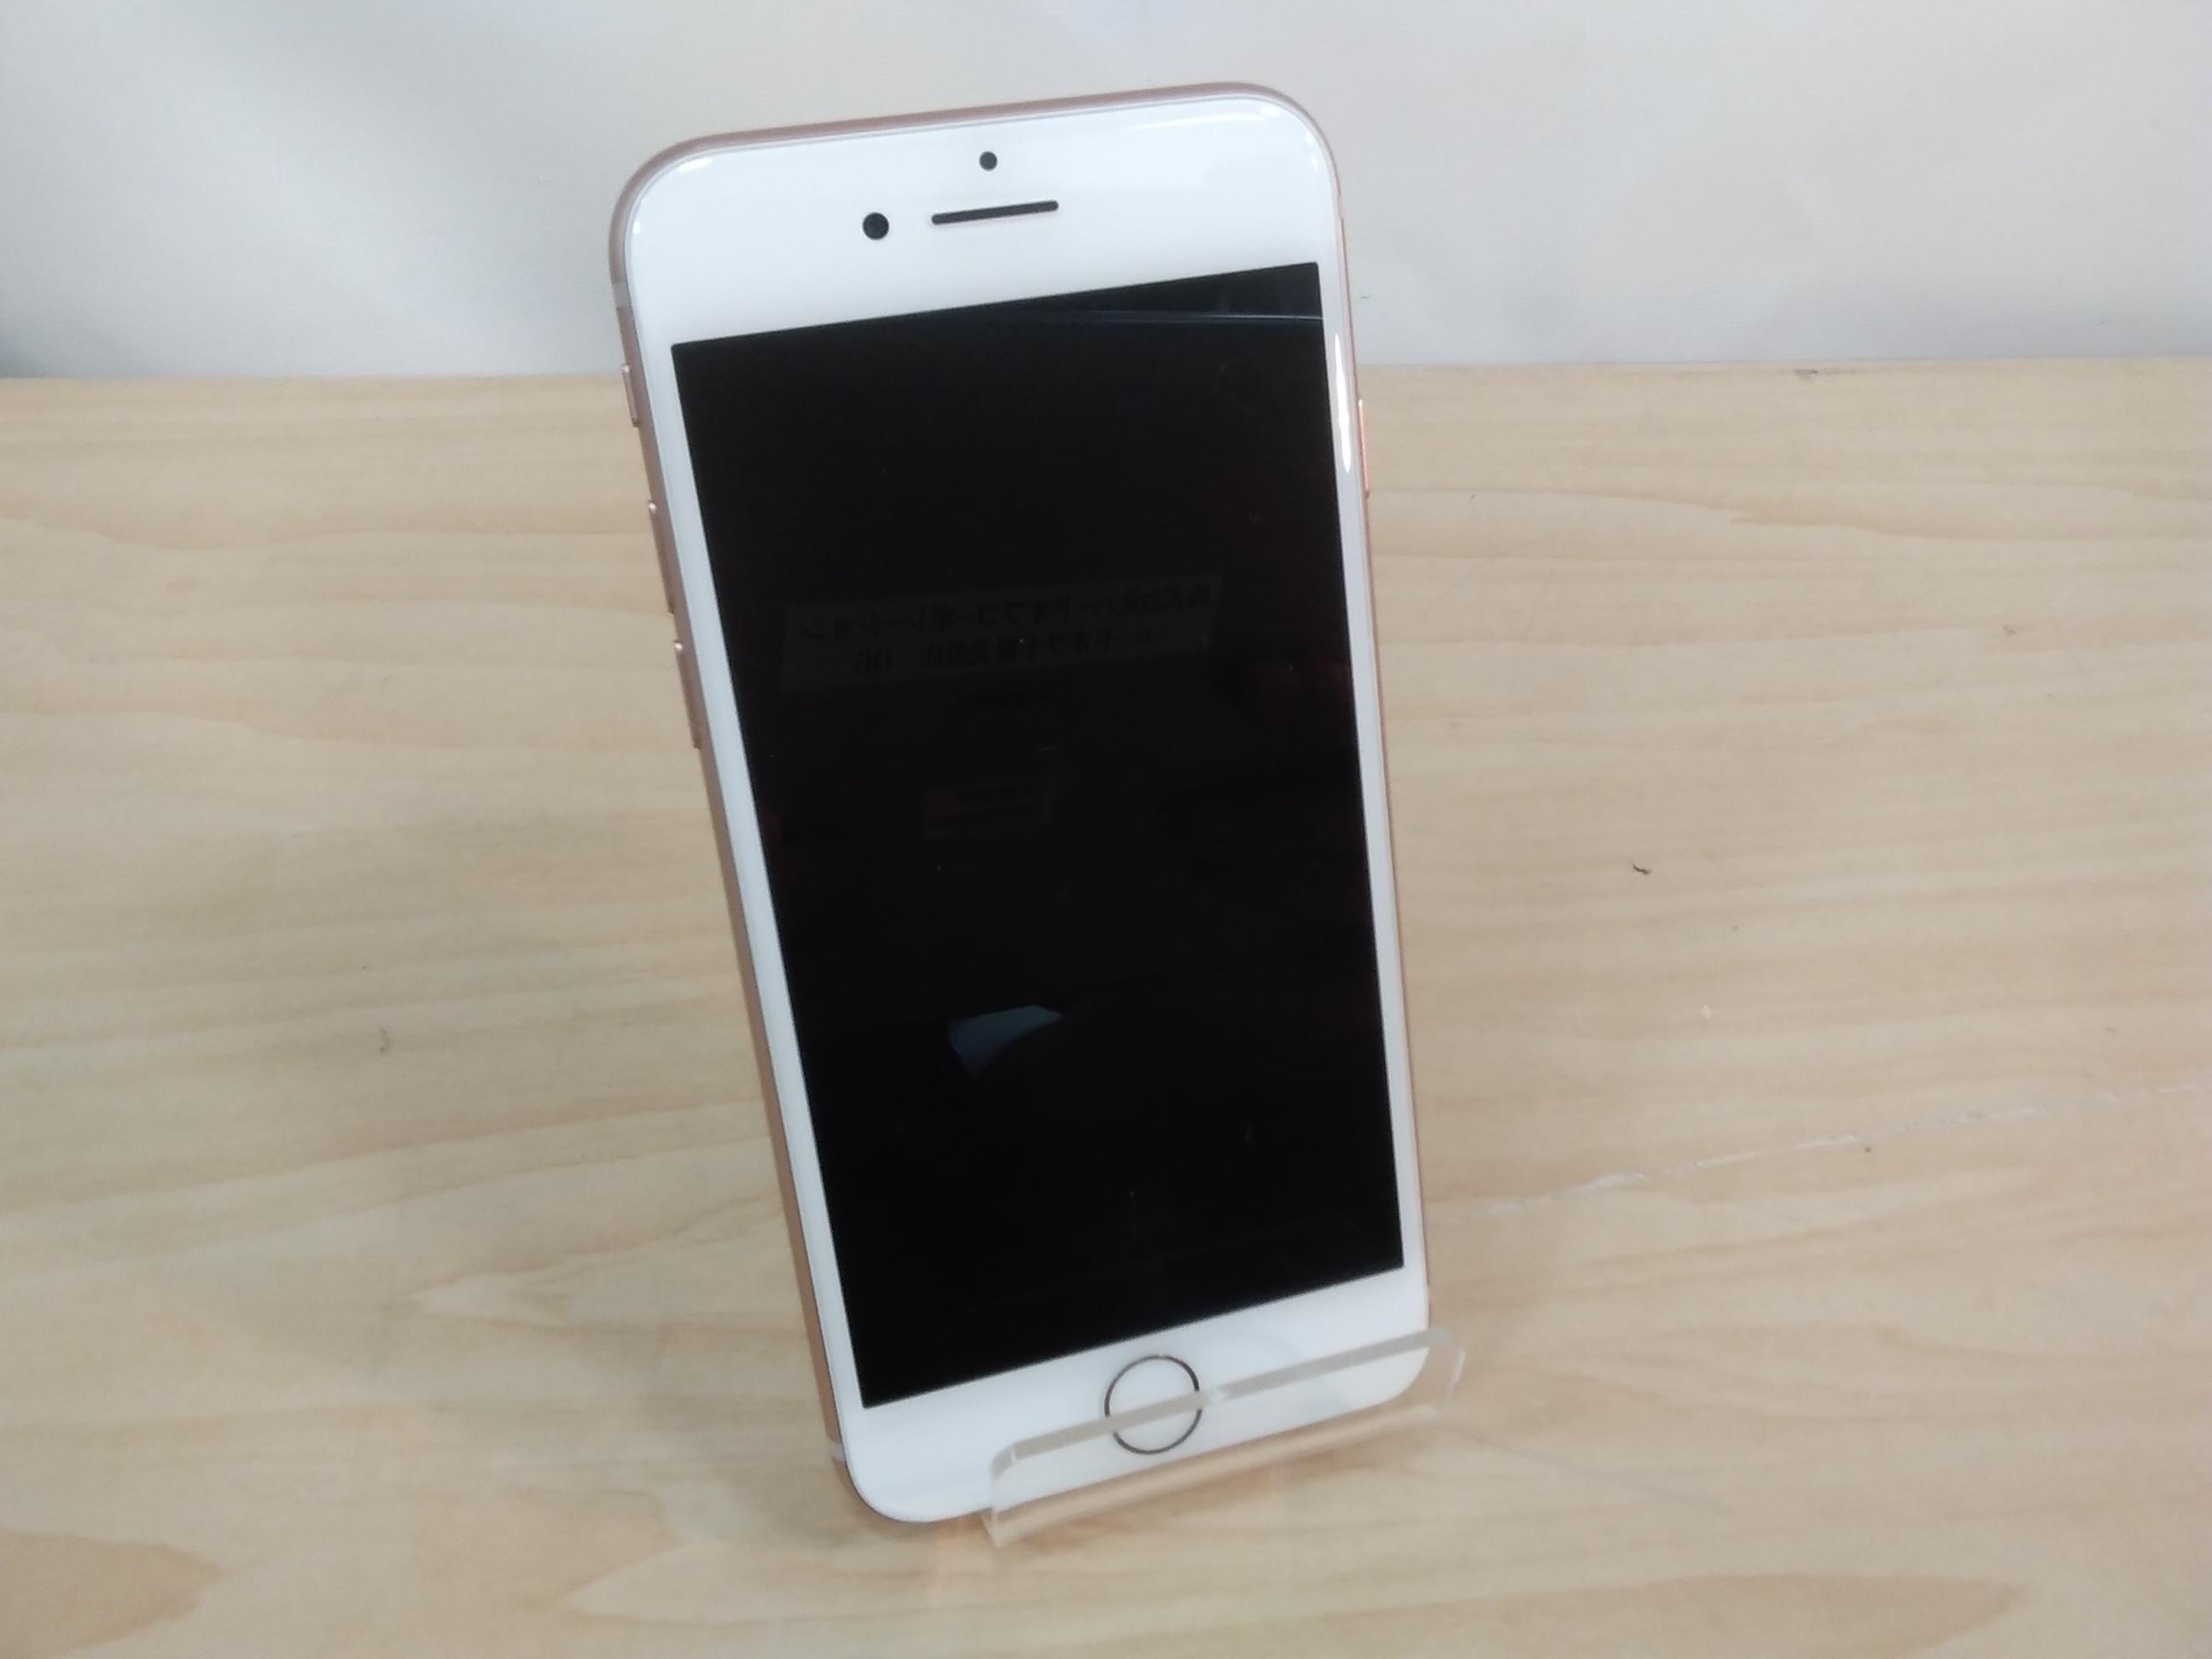 iphone APPLE/DOCOMO